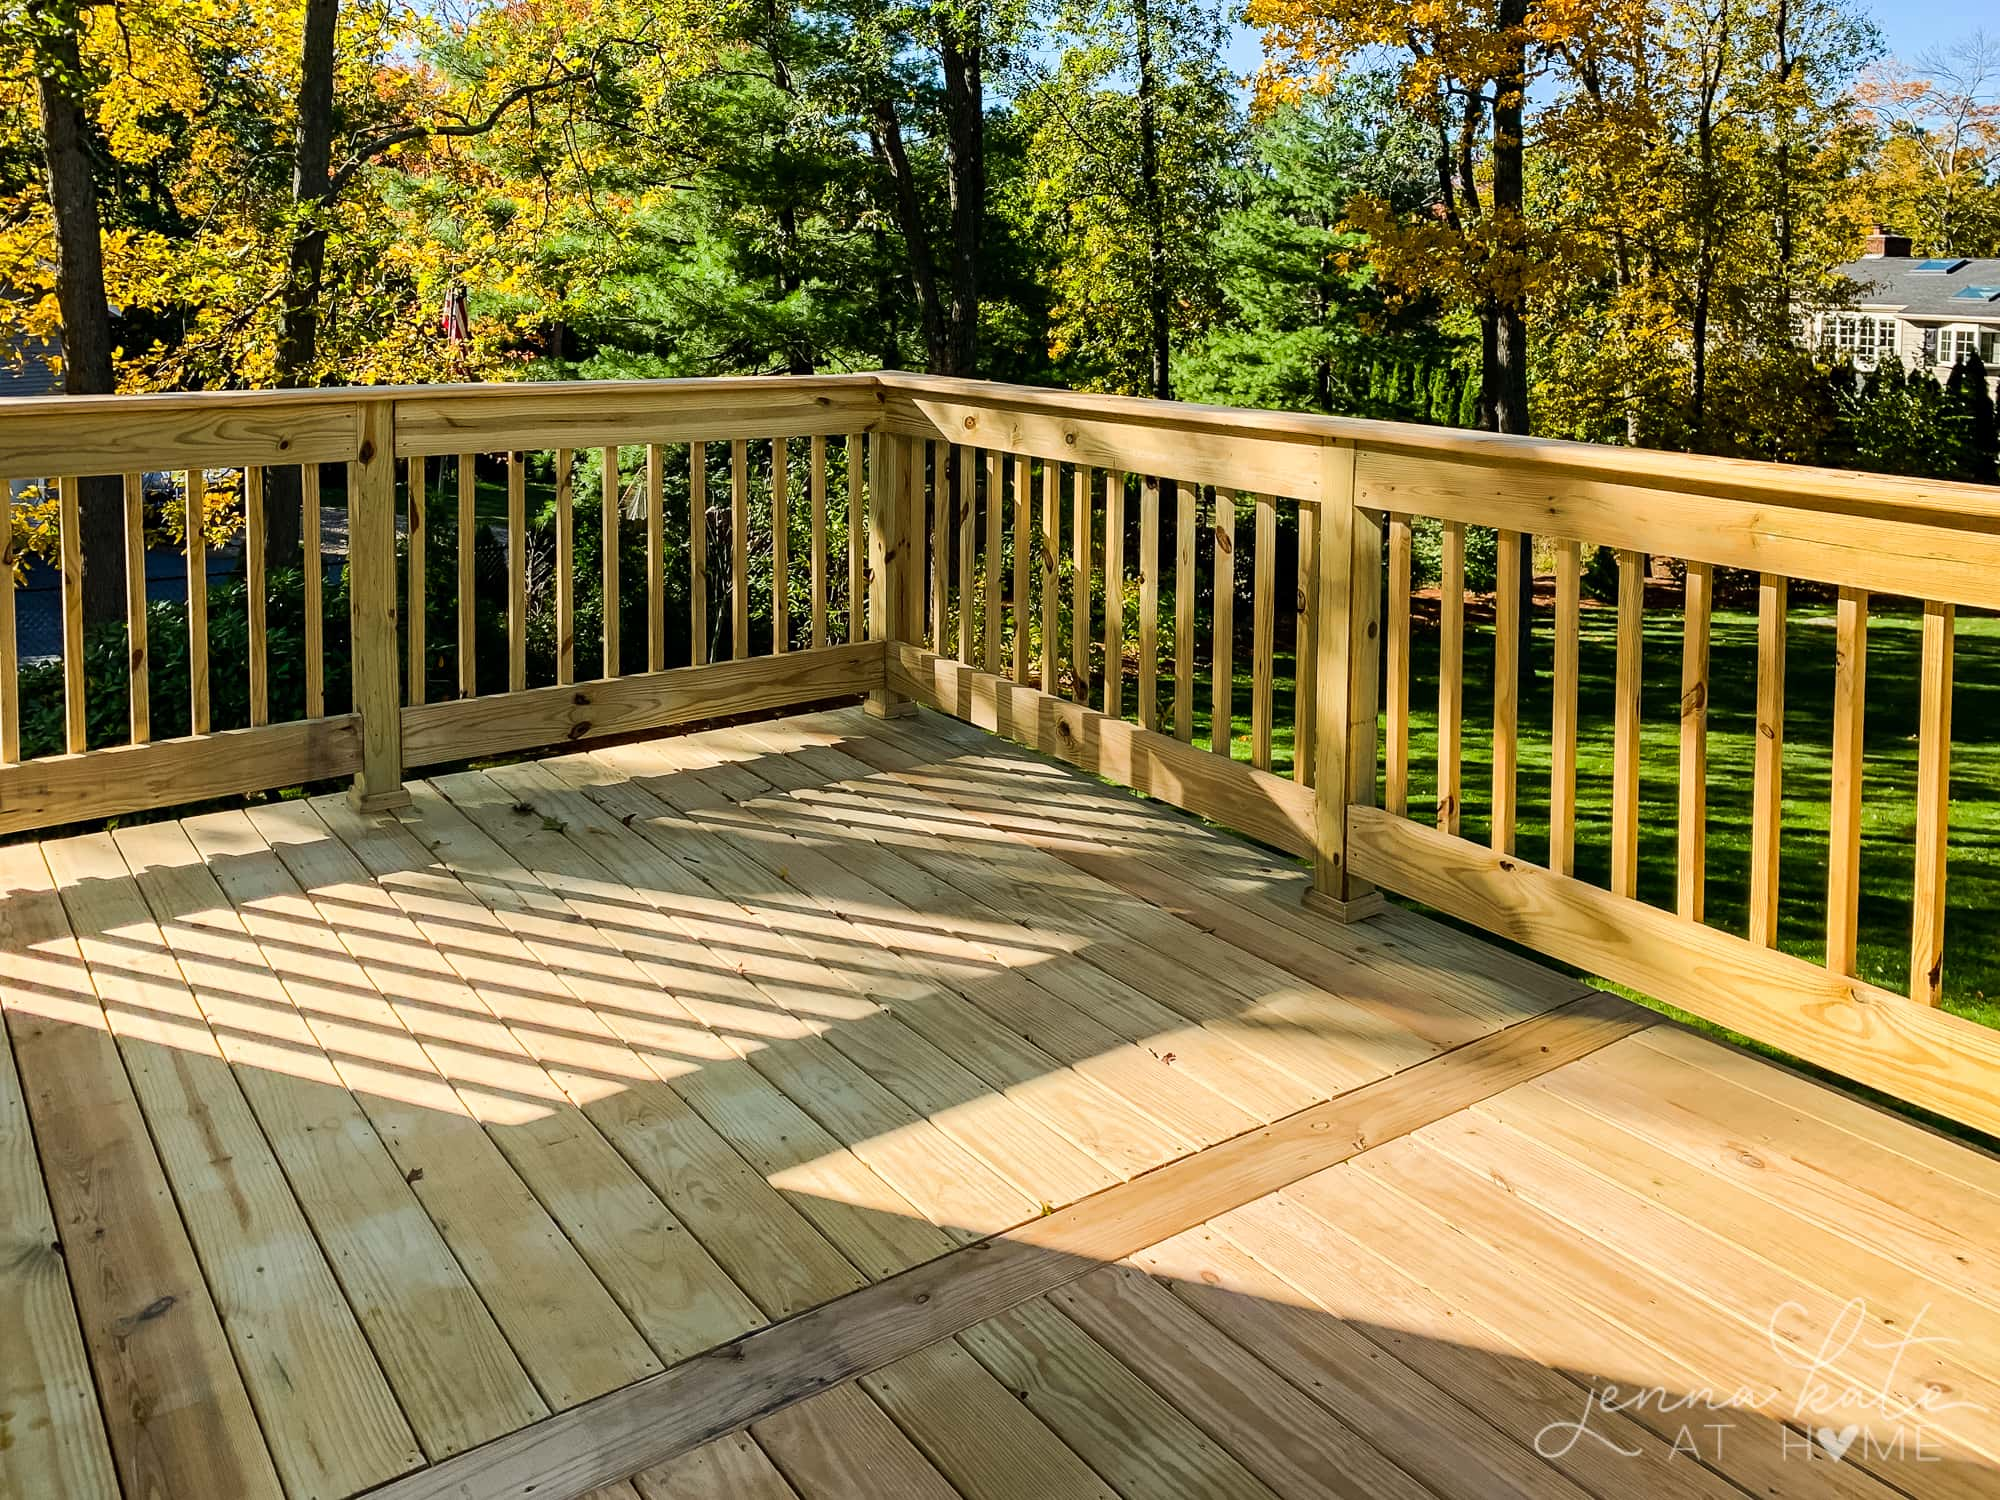 New pressure treated wood deck